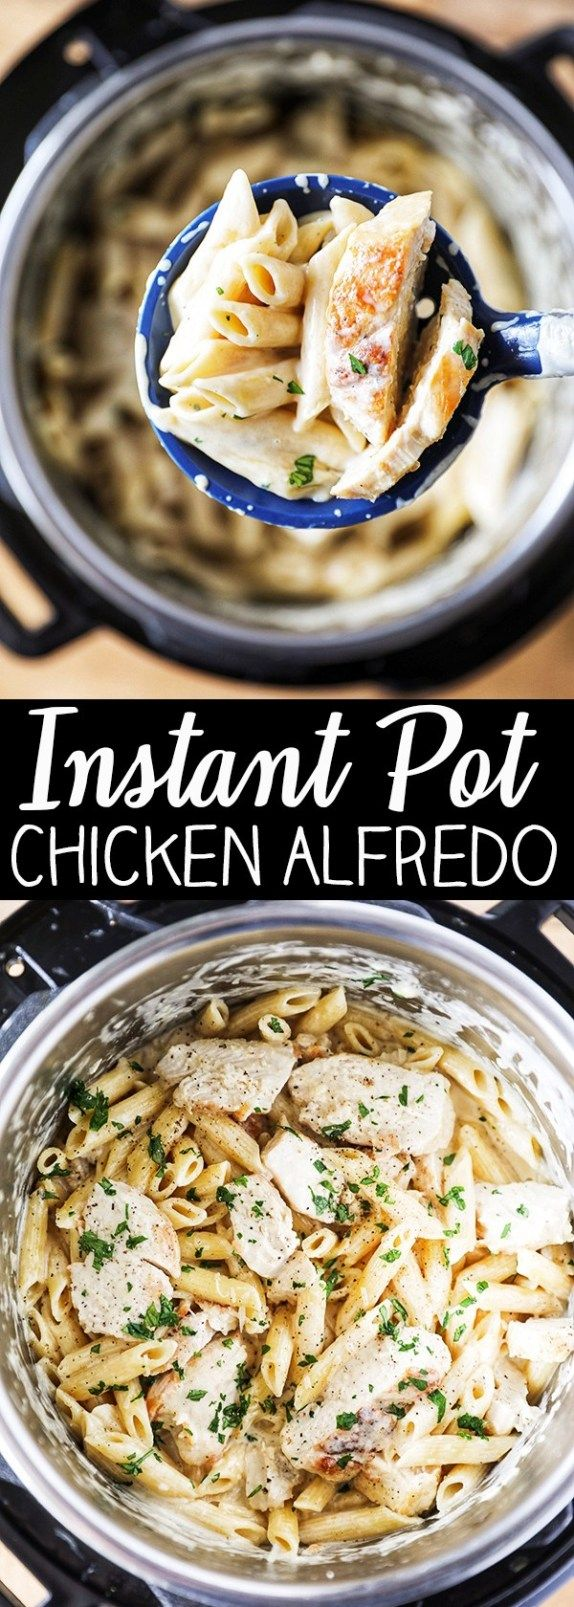 Instant Pot Chicken Alfredo Pasta #chickenalfredo